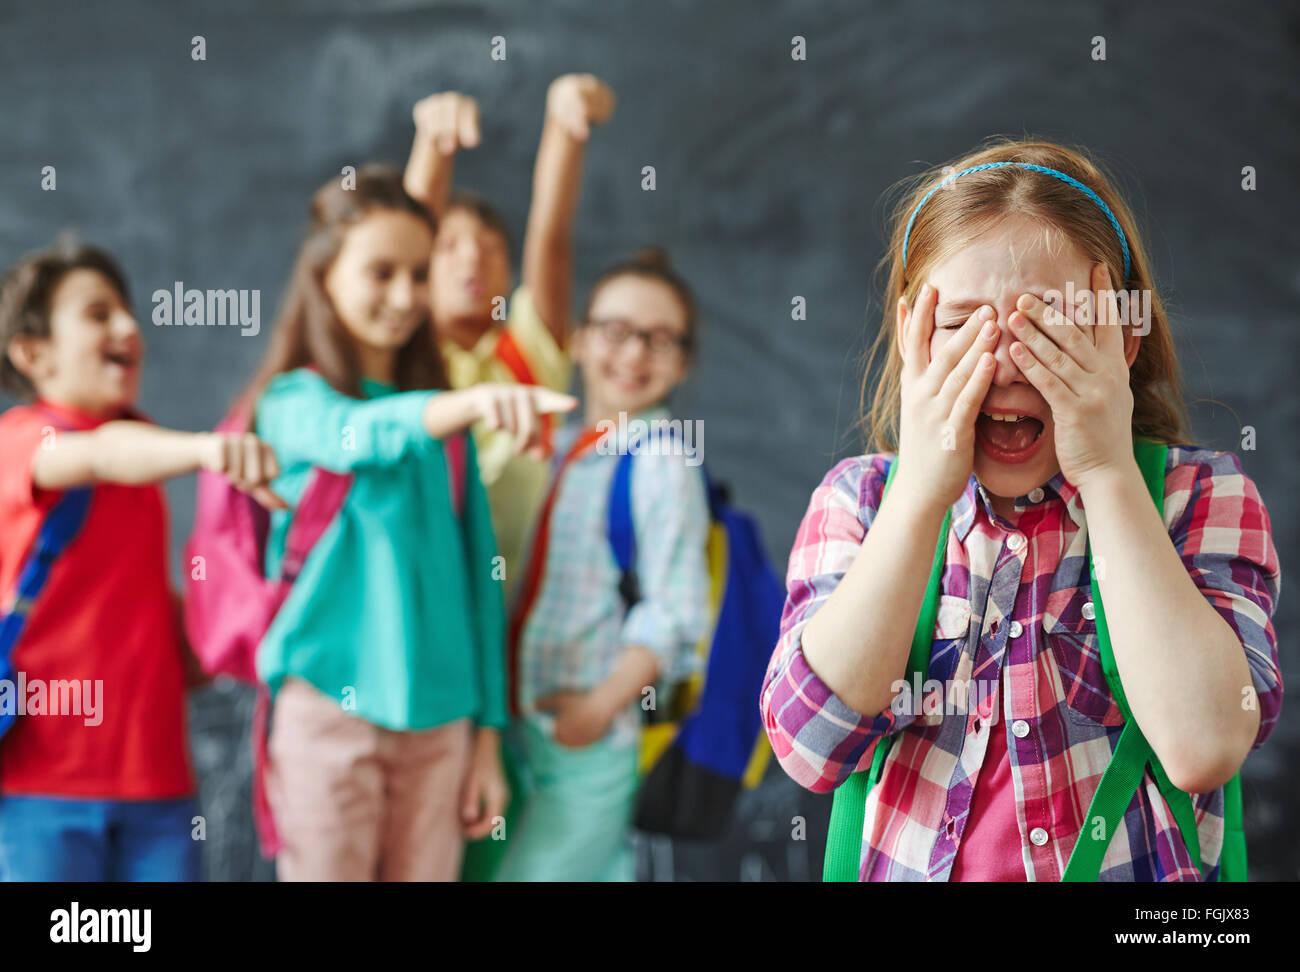 Schoolgirl crying on background of teasing classmates - Stock Image